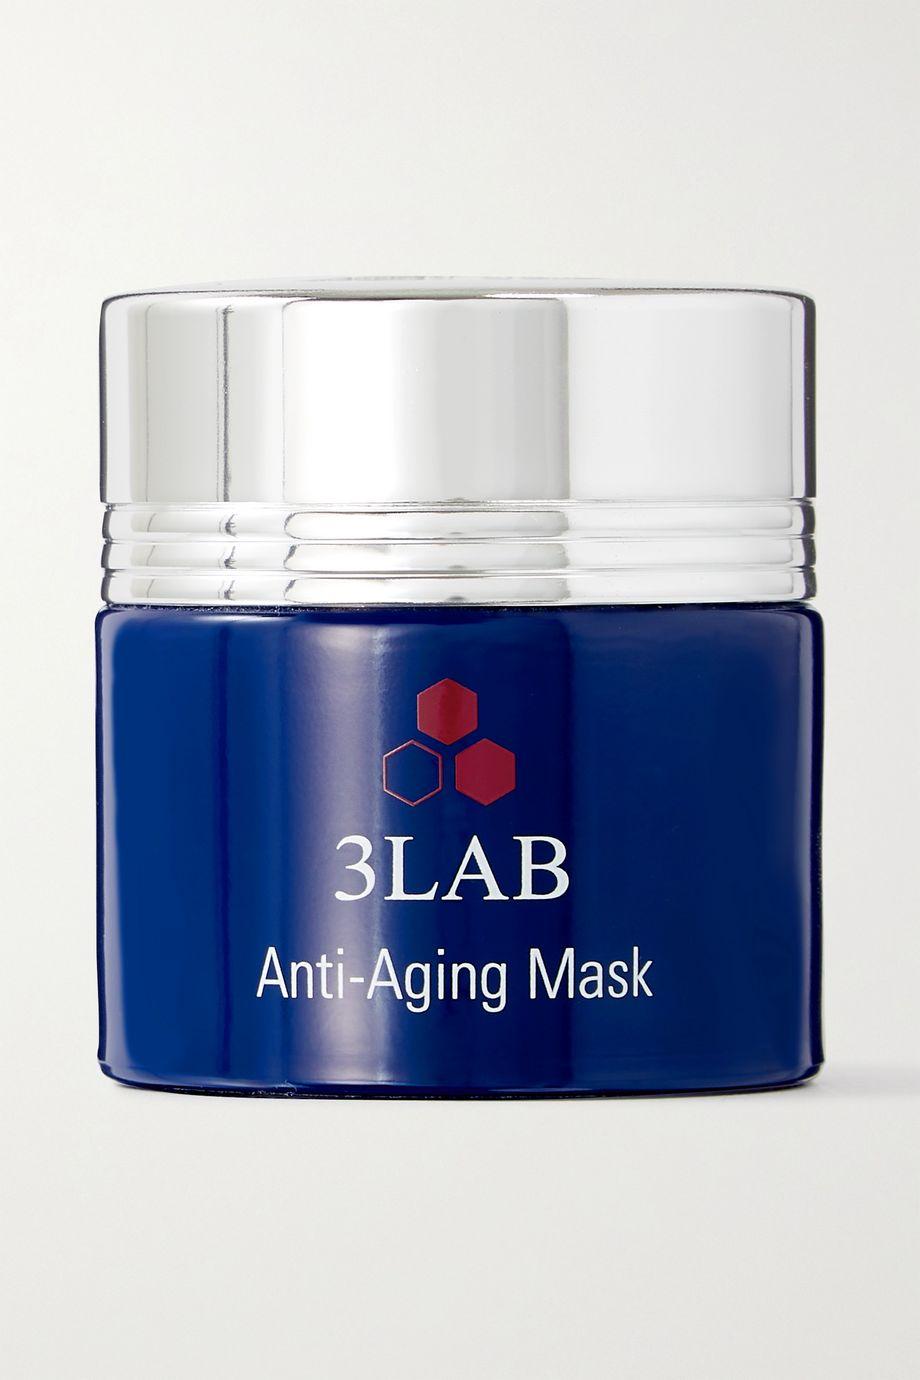 3LAB Anti-Aging Mask, 60 ml – Anti-Ageing-Gesichtscreme